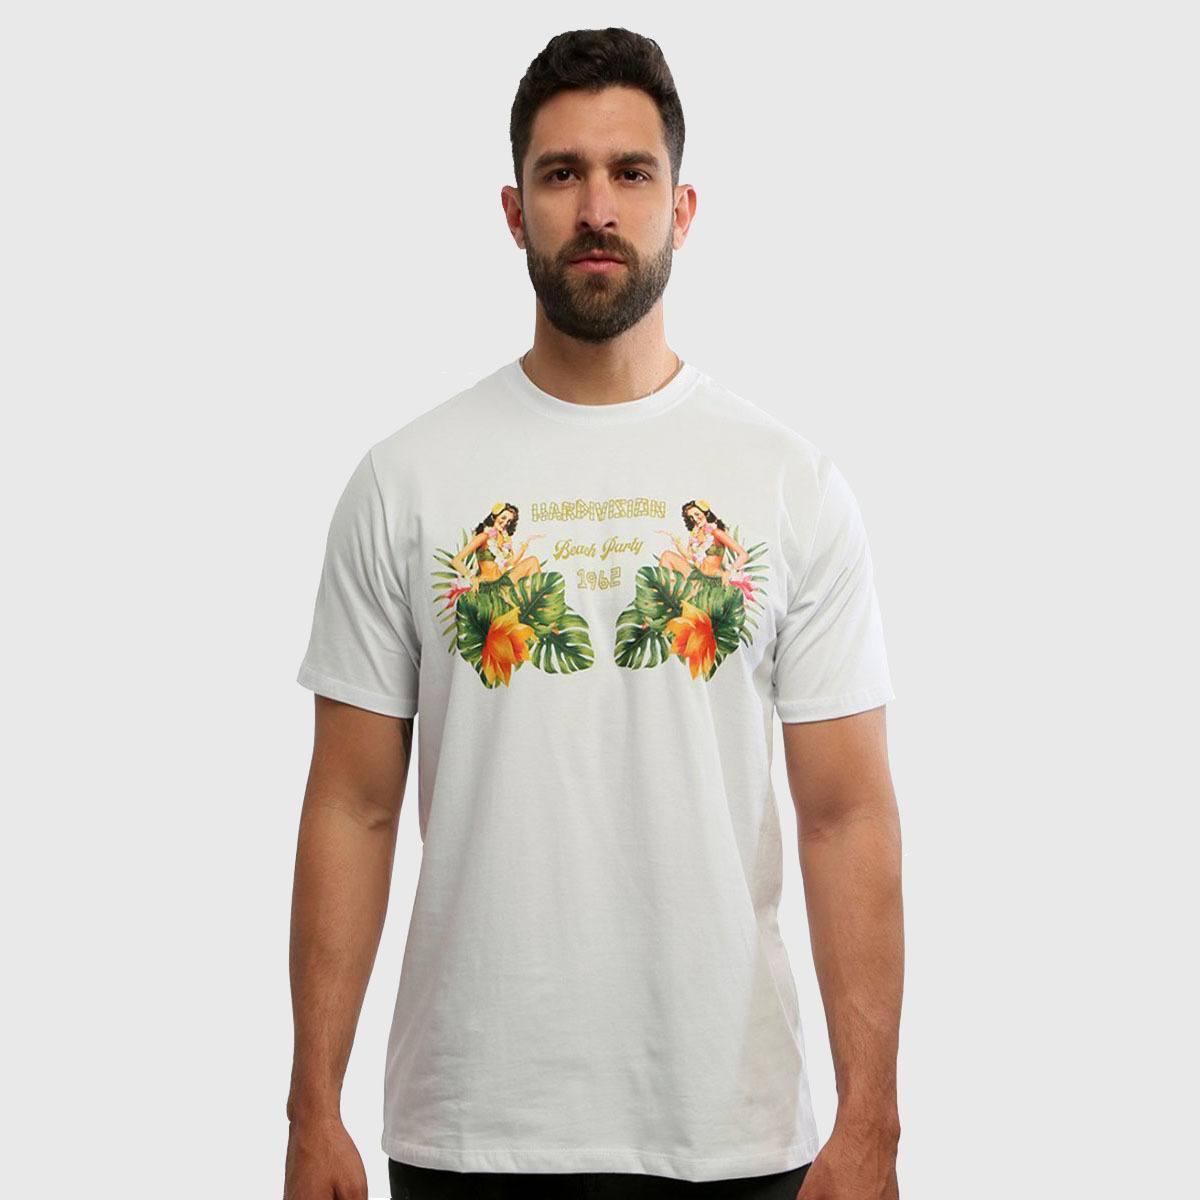 Camiseta Masculina Branca Manga Curta Beach Hardivision